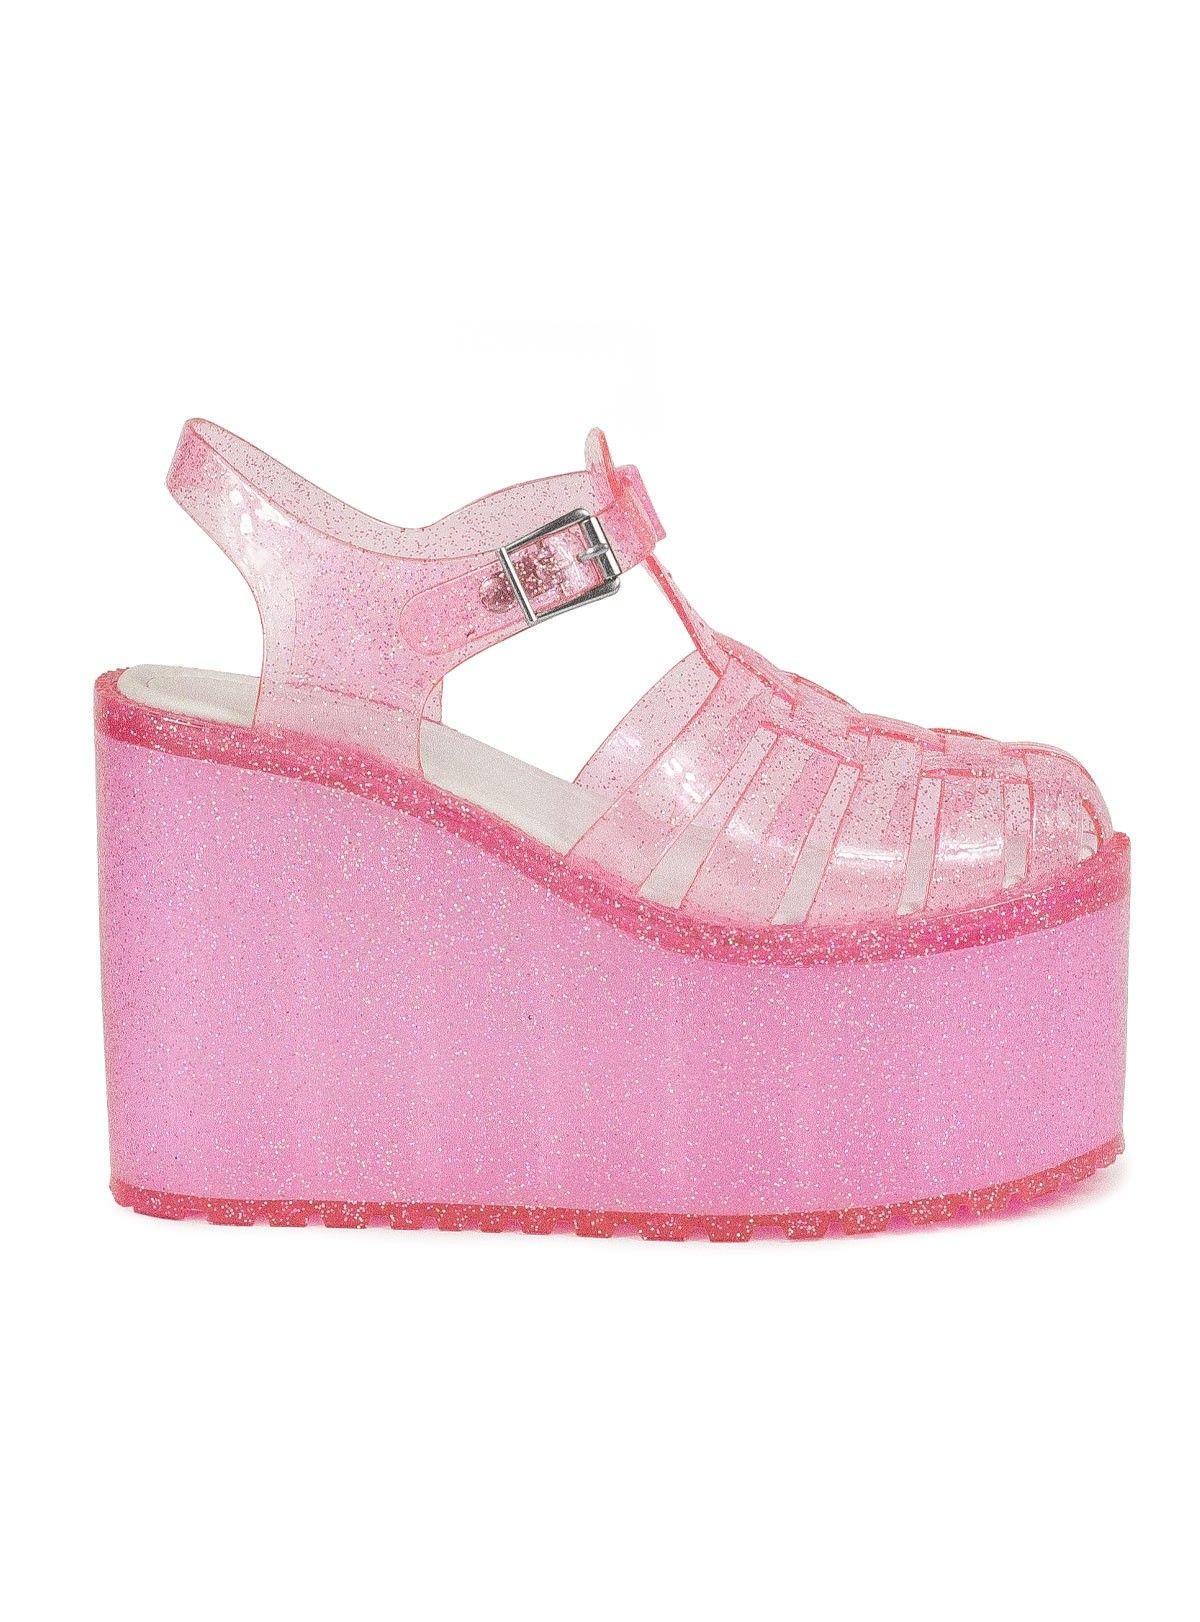 3313e563819 http   unifclothing.com shop-all-shoes hella-